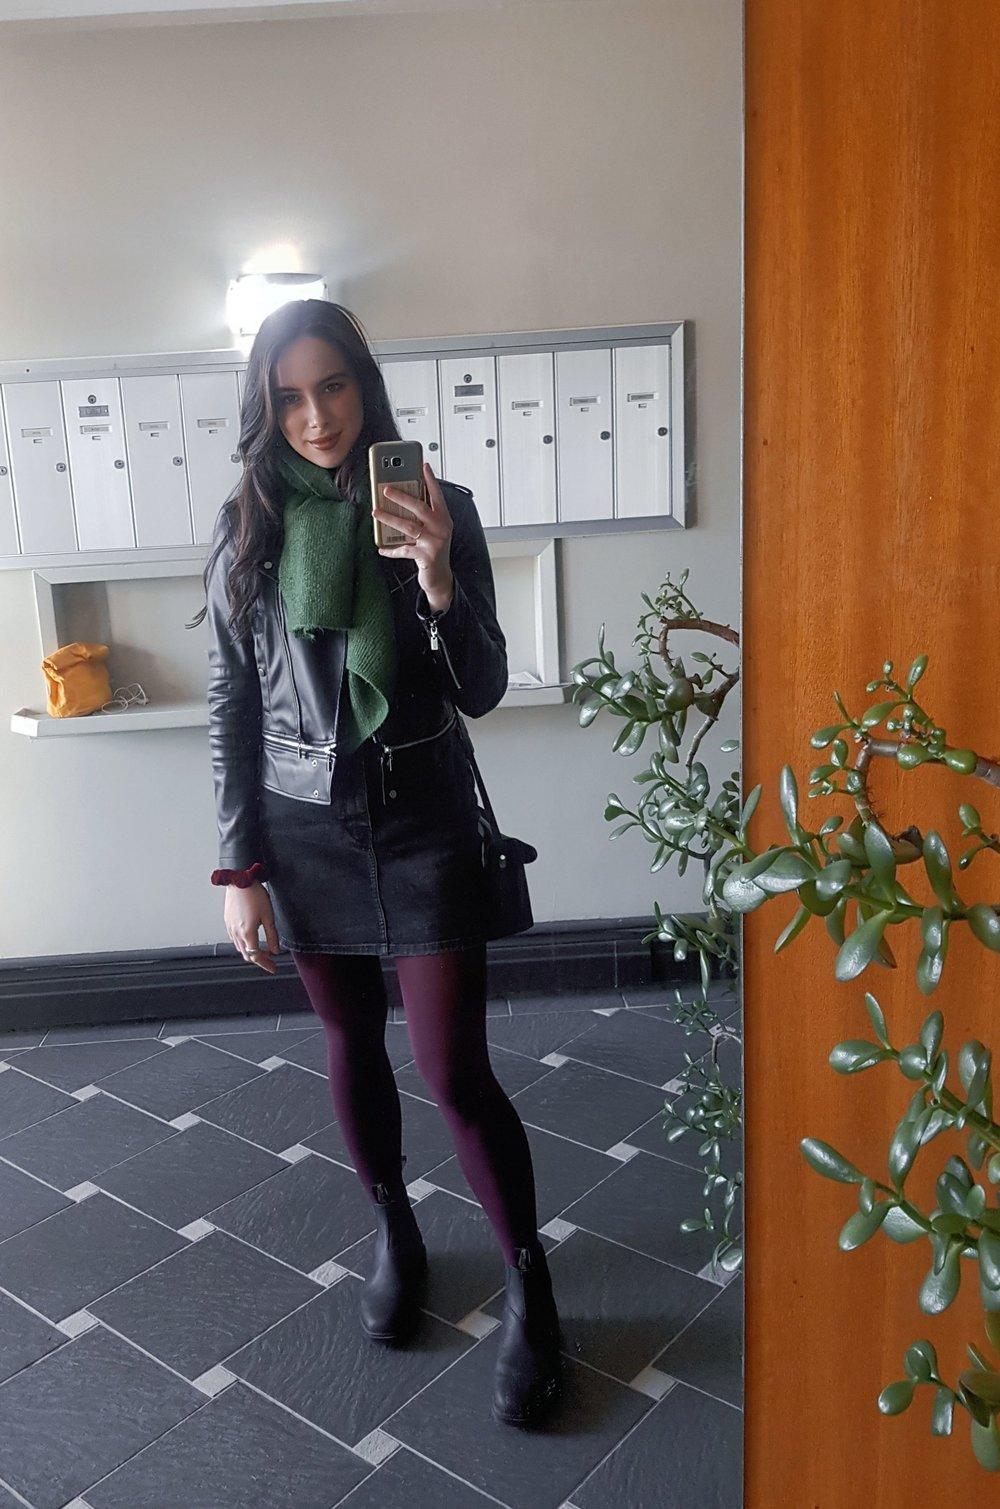 WEDNESDAY - Zara jacket & skirt, 8th&Main scarf, Blundstone boots